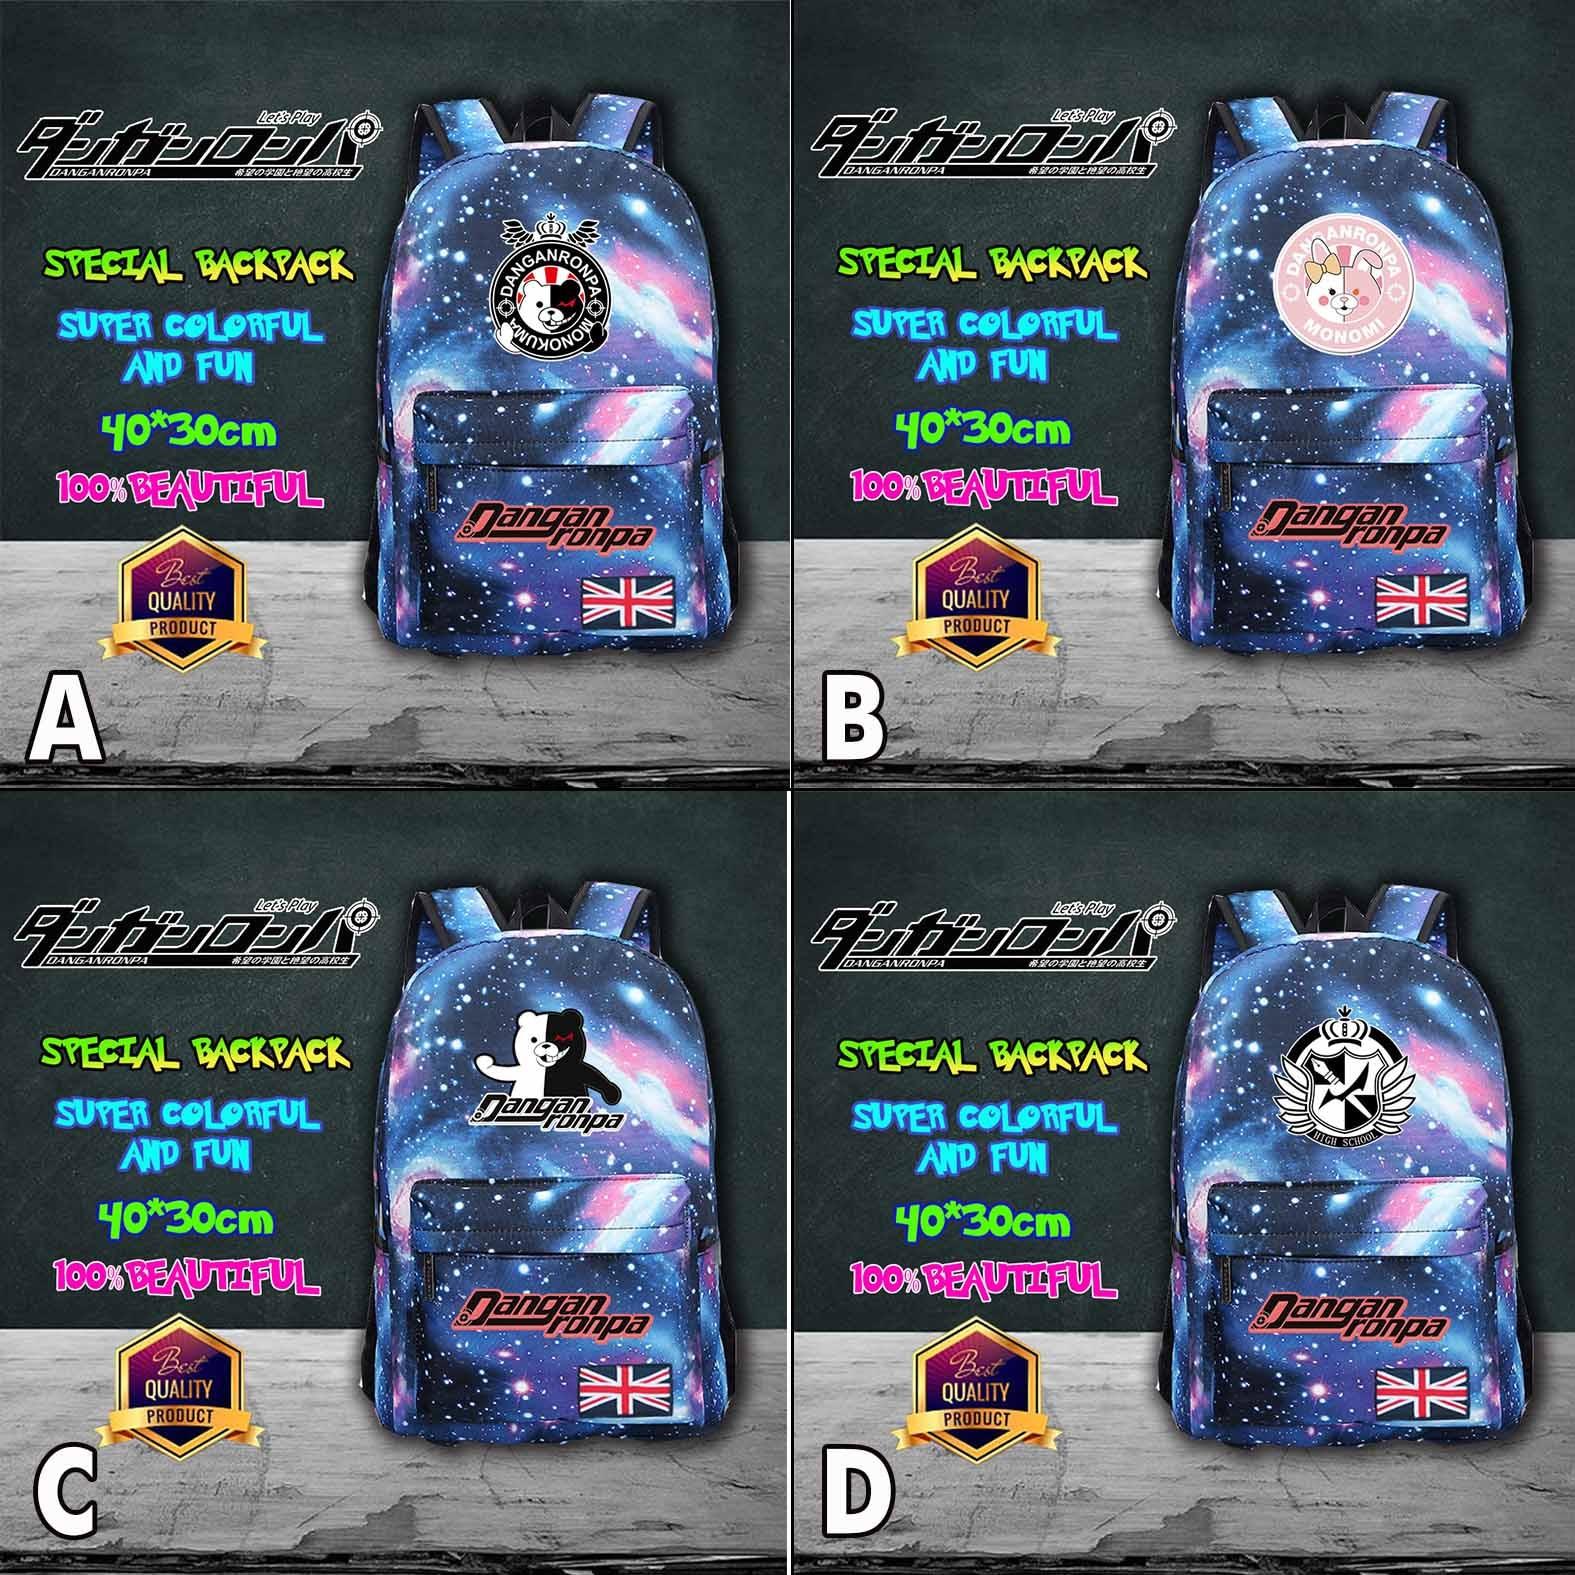 Danganronpa Trigger Happy Havoc Monokuma Kuma Bear Monomi Symbol Meteor Backpack Leisure Daily Backpack Student School Bag Cool